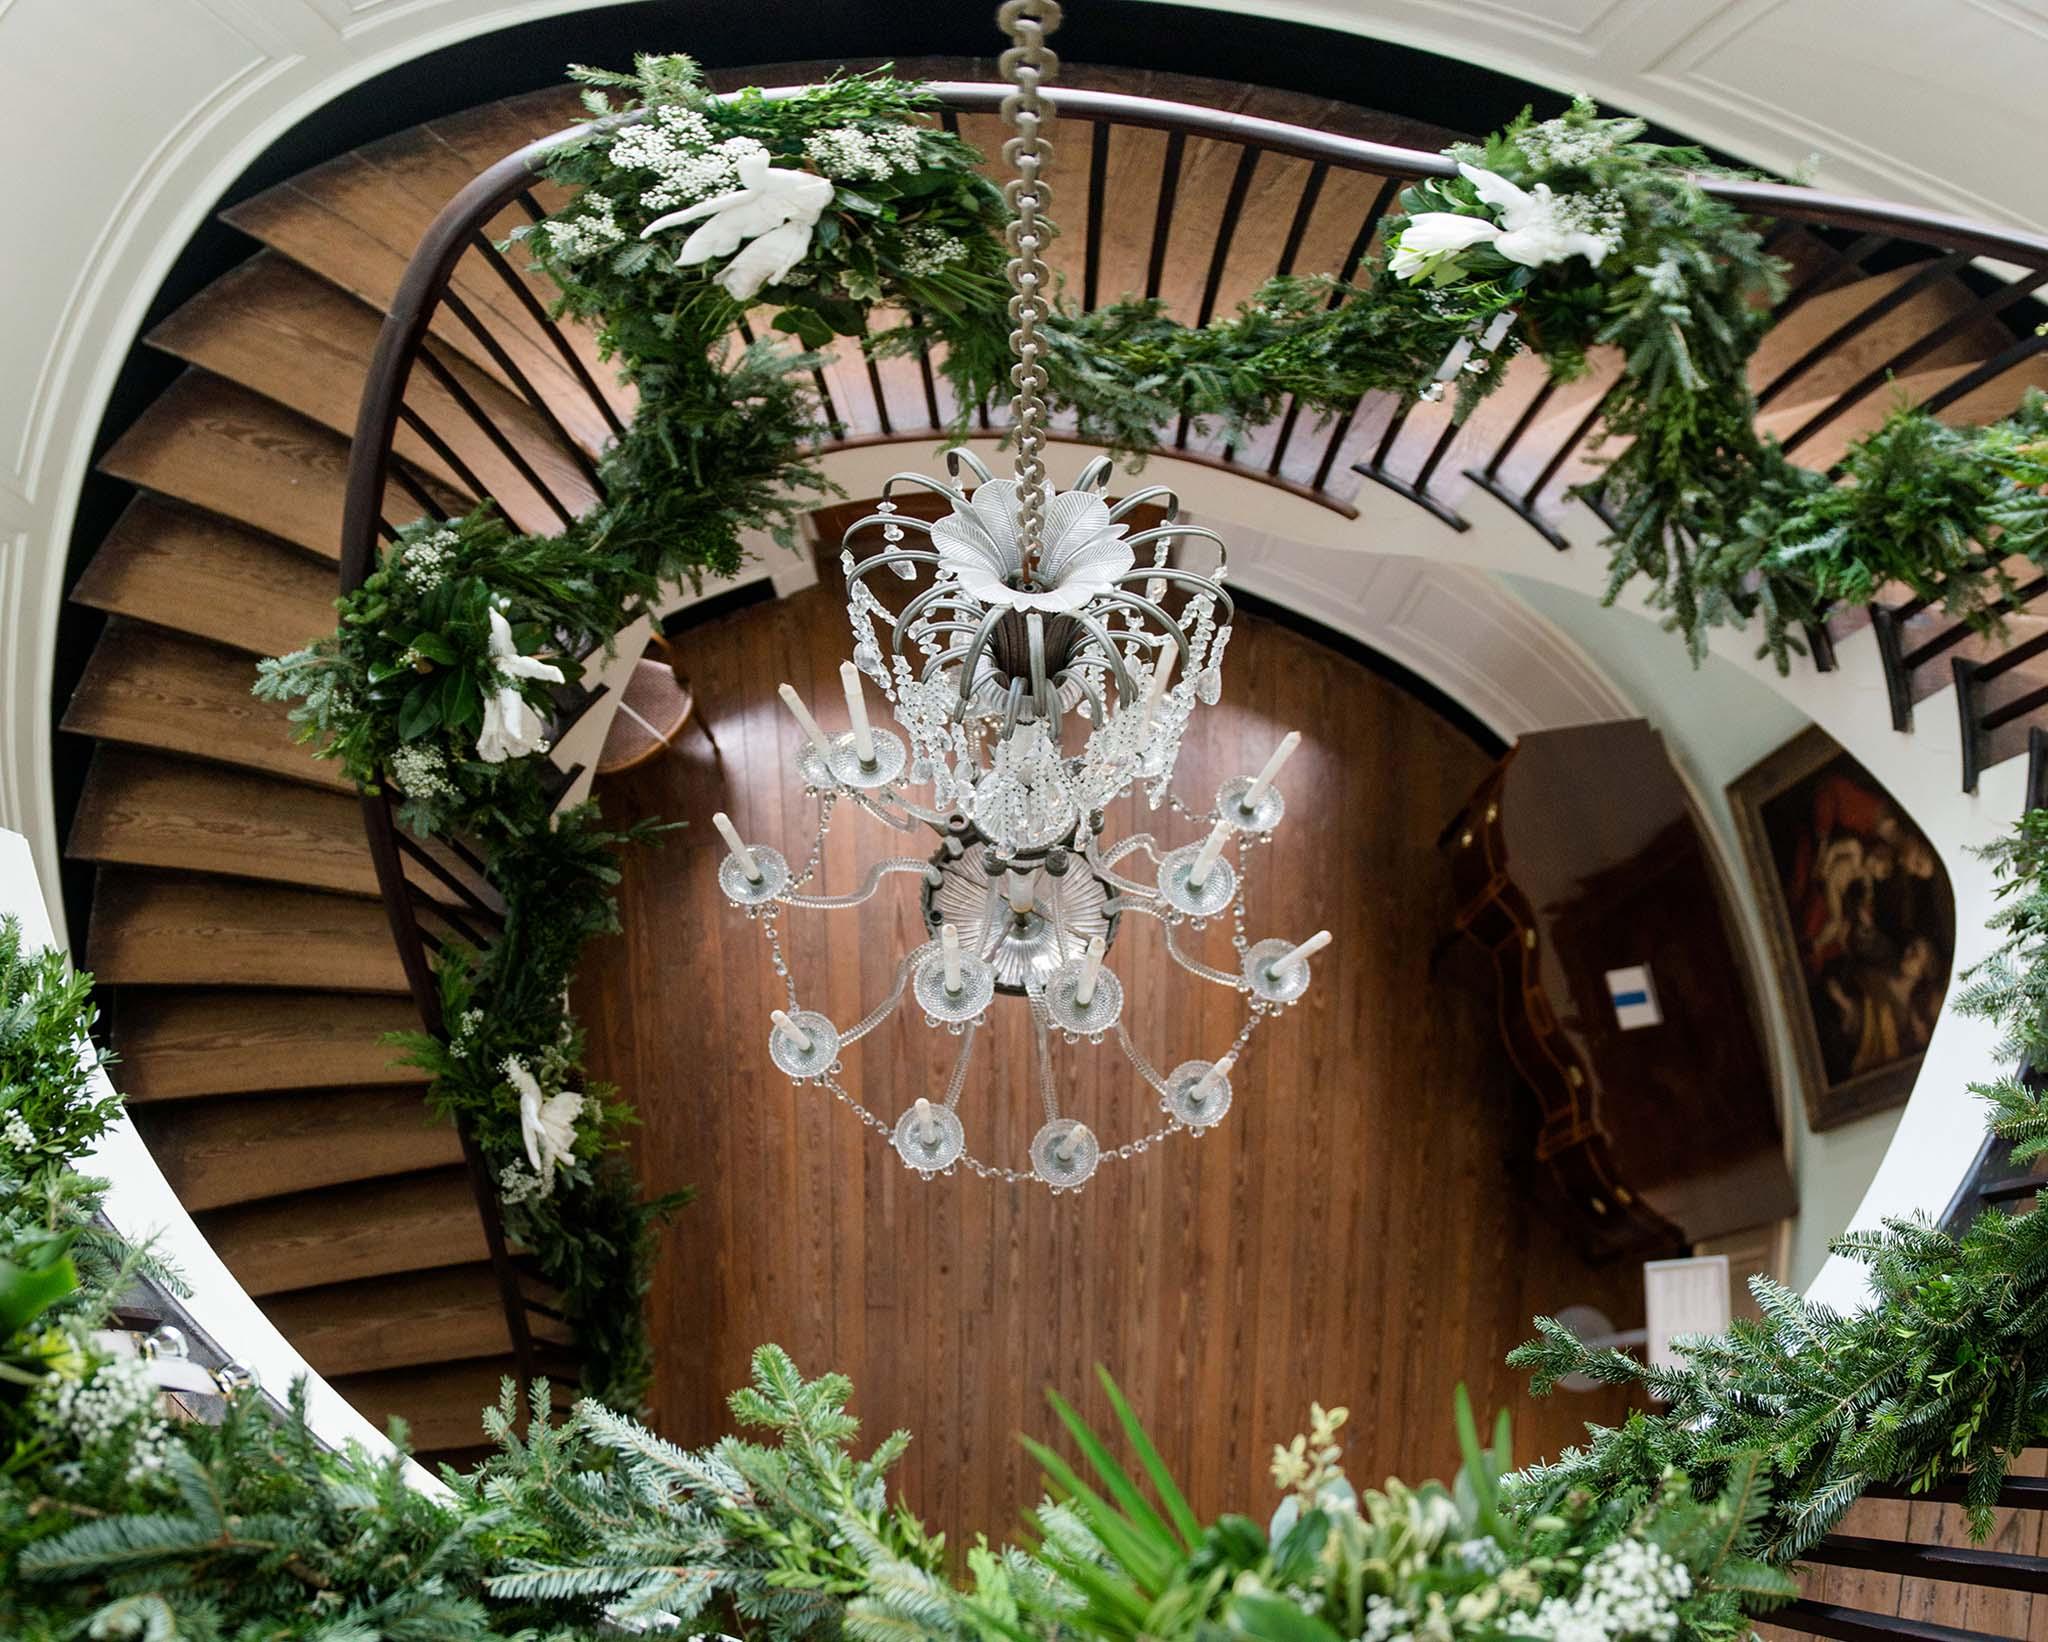 Garden Club of Charleston Holiday Decorations at the Joseph Manigault House